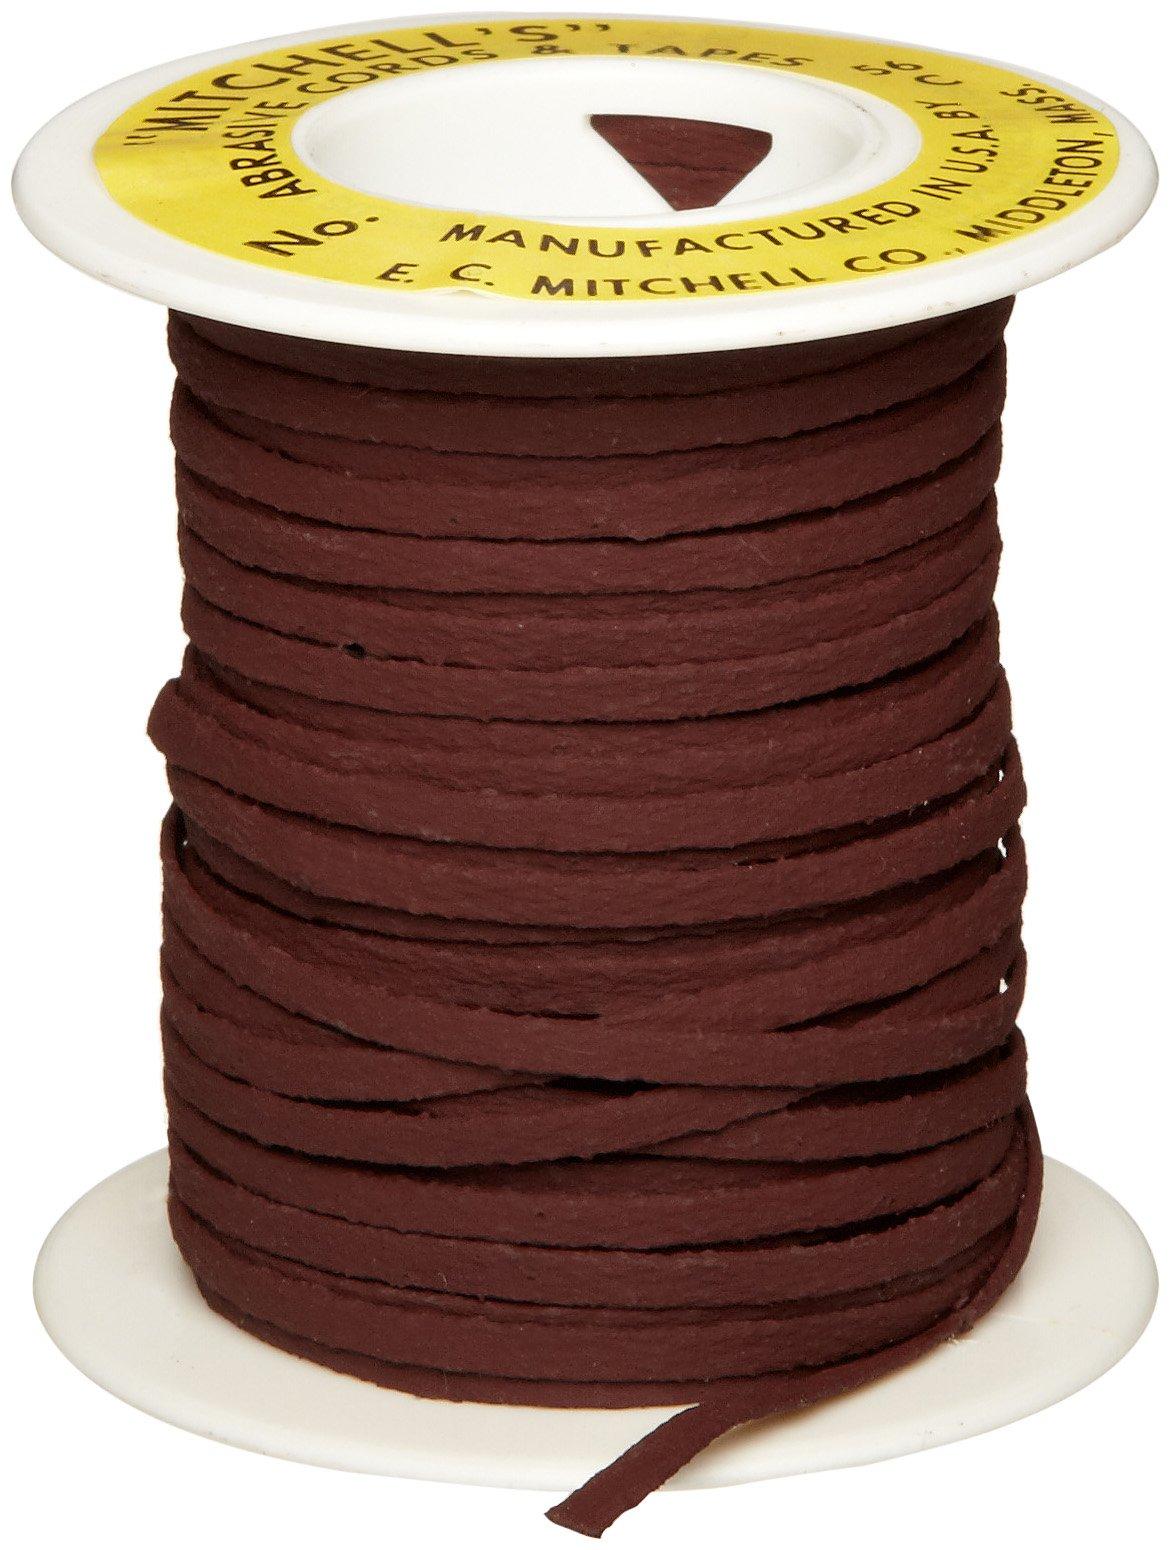 3//4 Wide 30 Length Standard Back Sew-On Hook Only VELCRO 1003-AP-PB//H Black Nylon Woven Fastening Tape